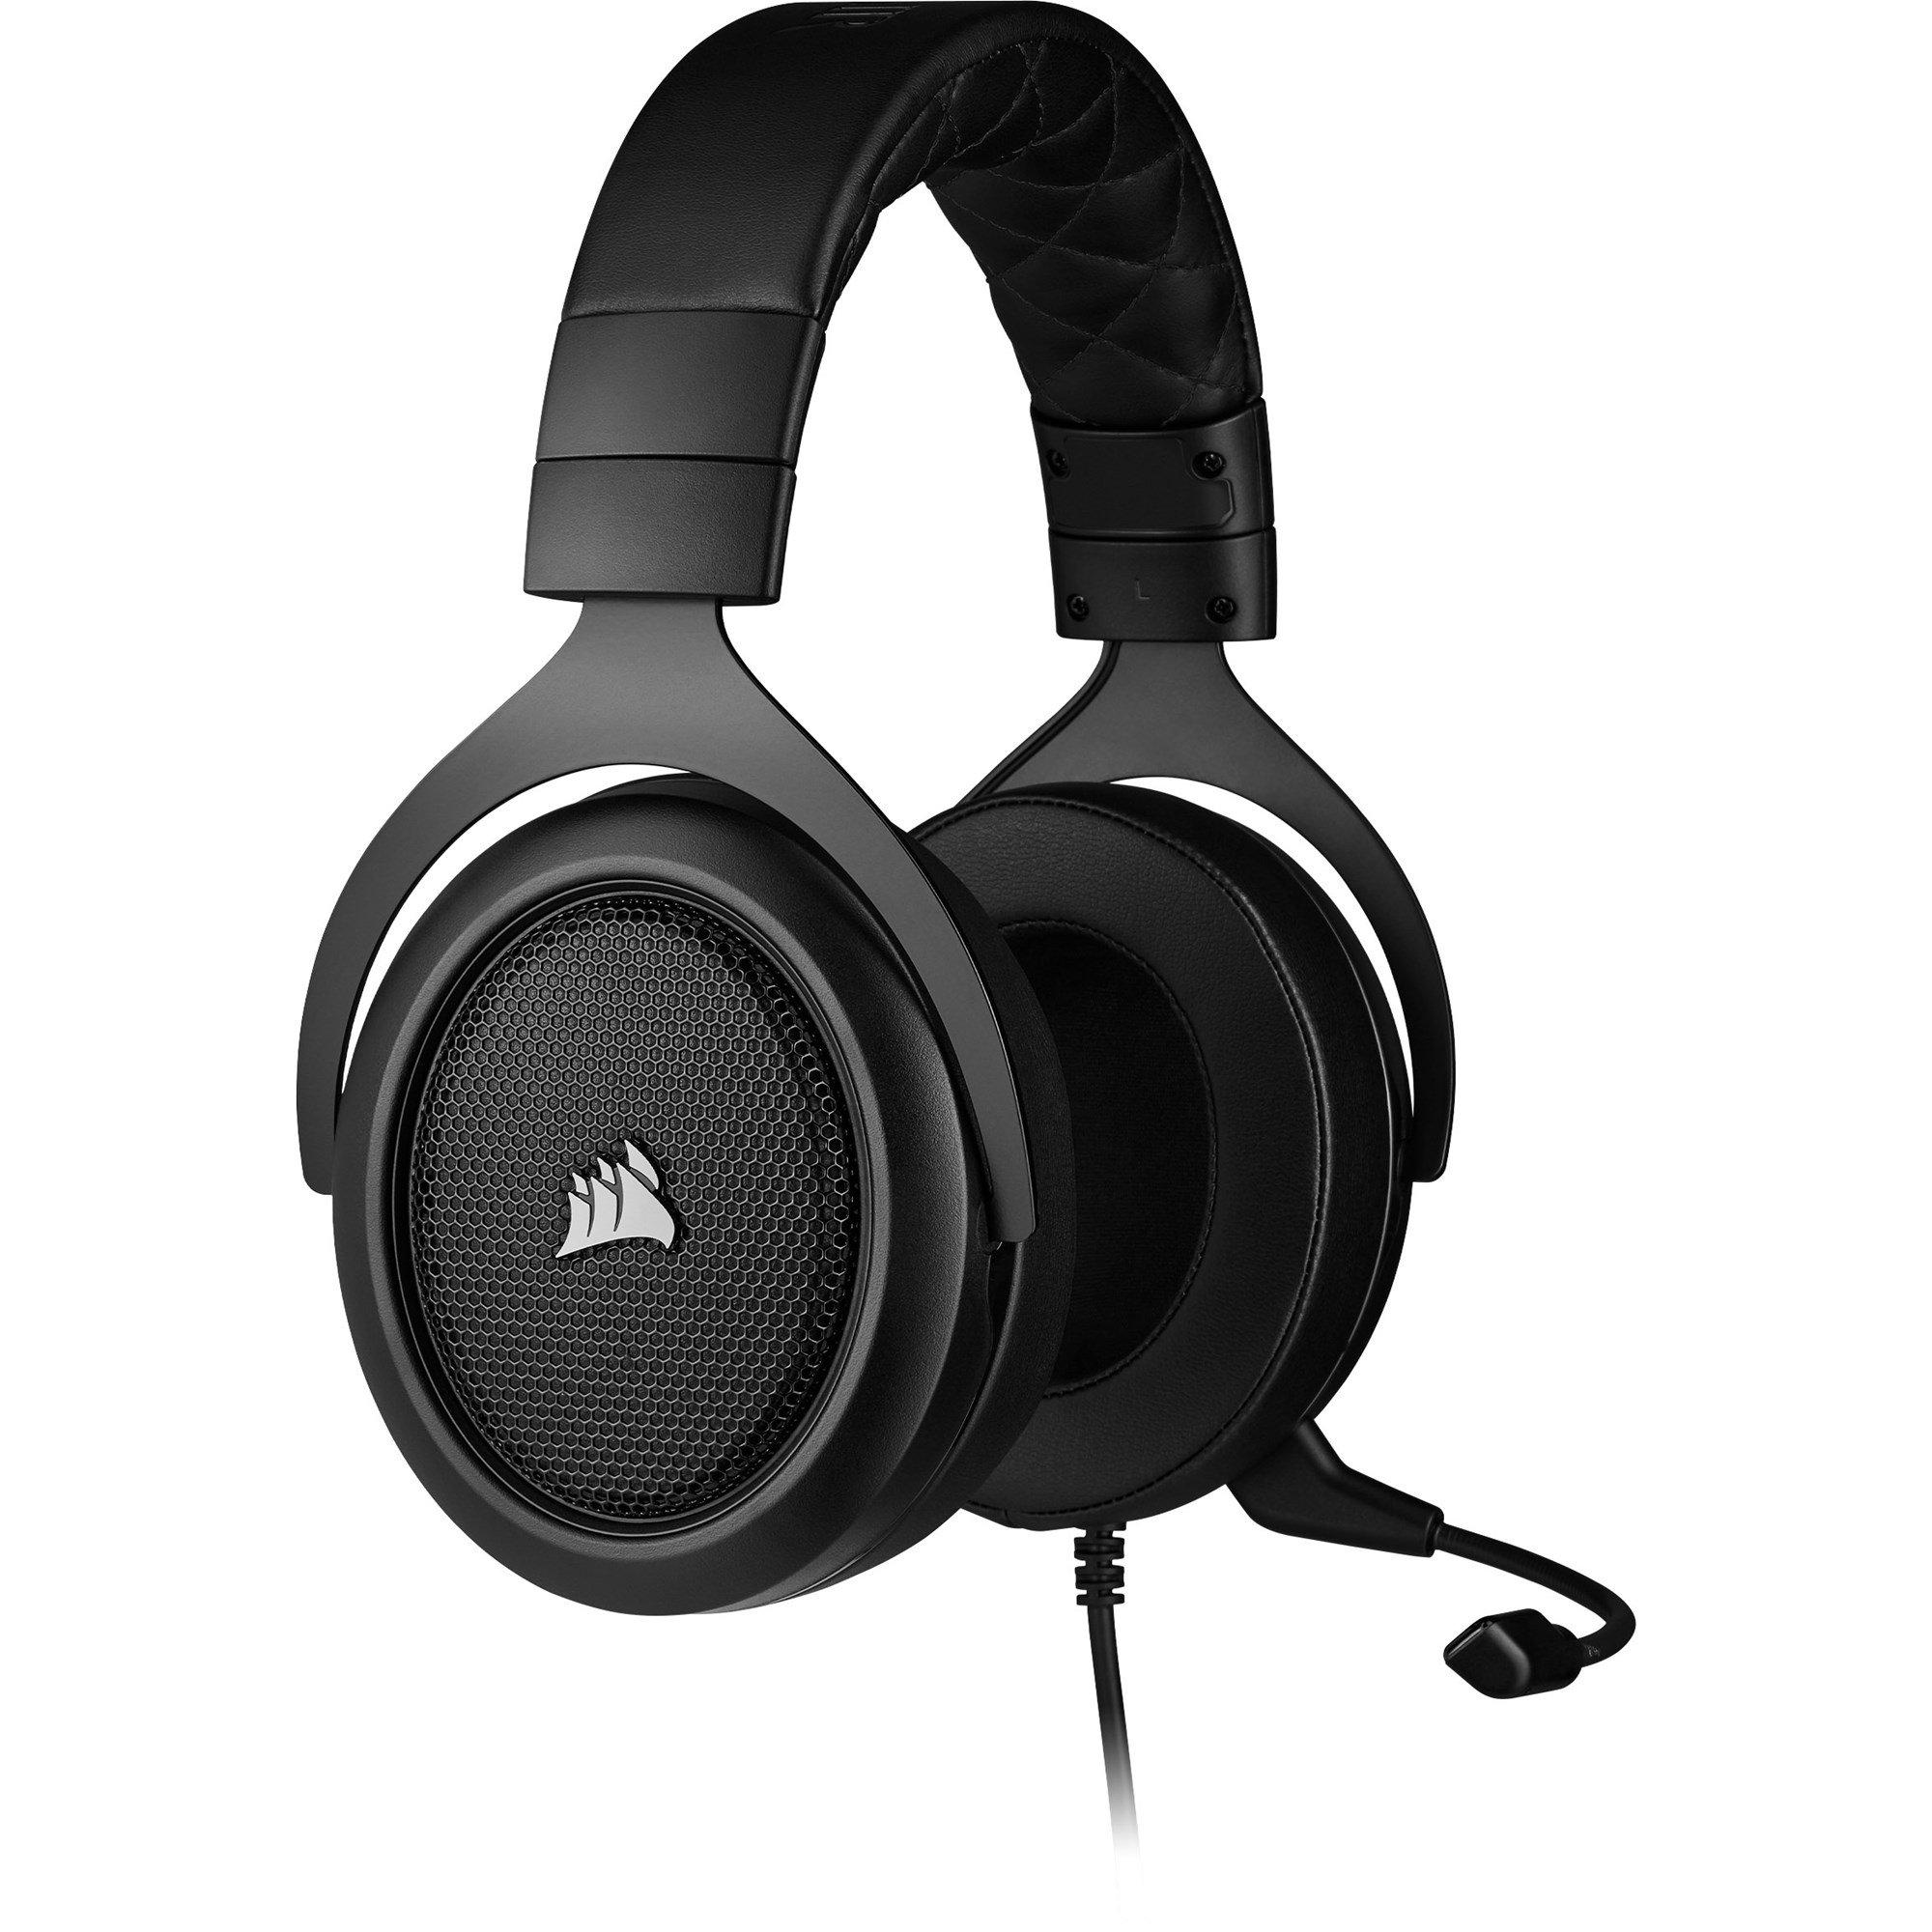 Corsair HS50 Stereo Gaming Headset